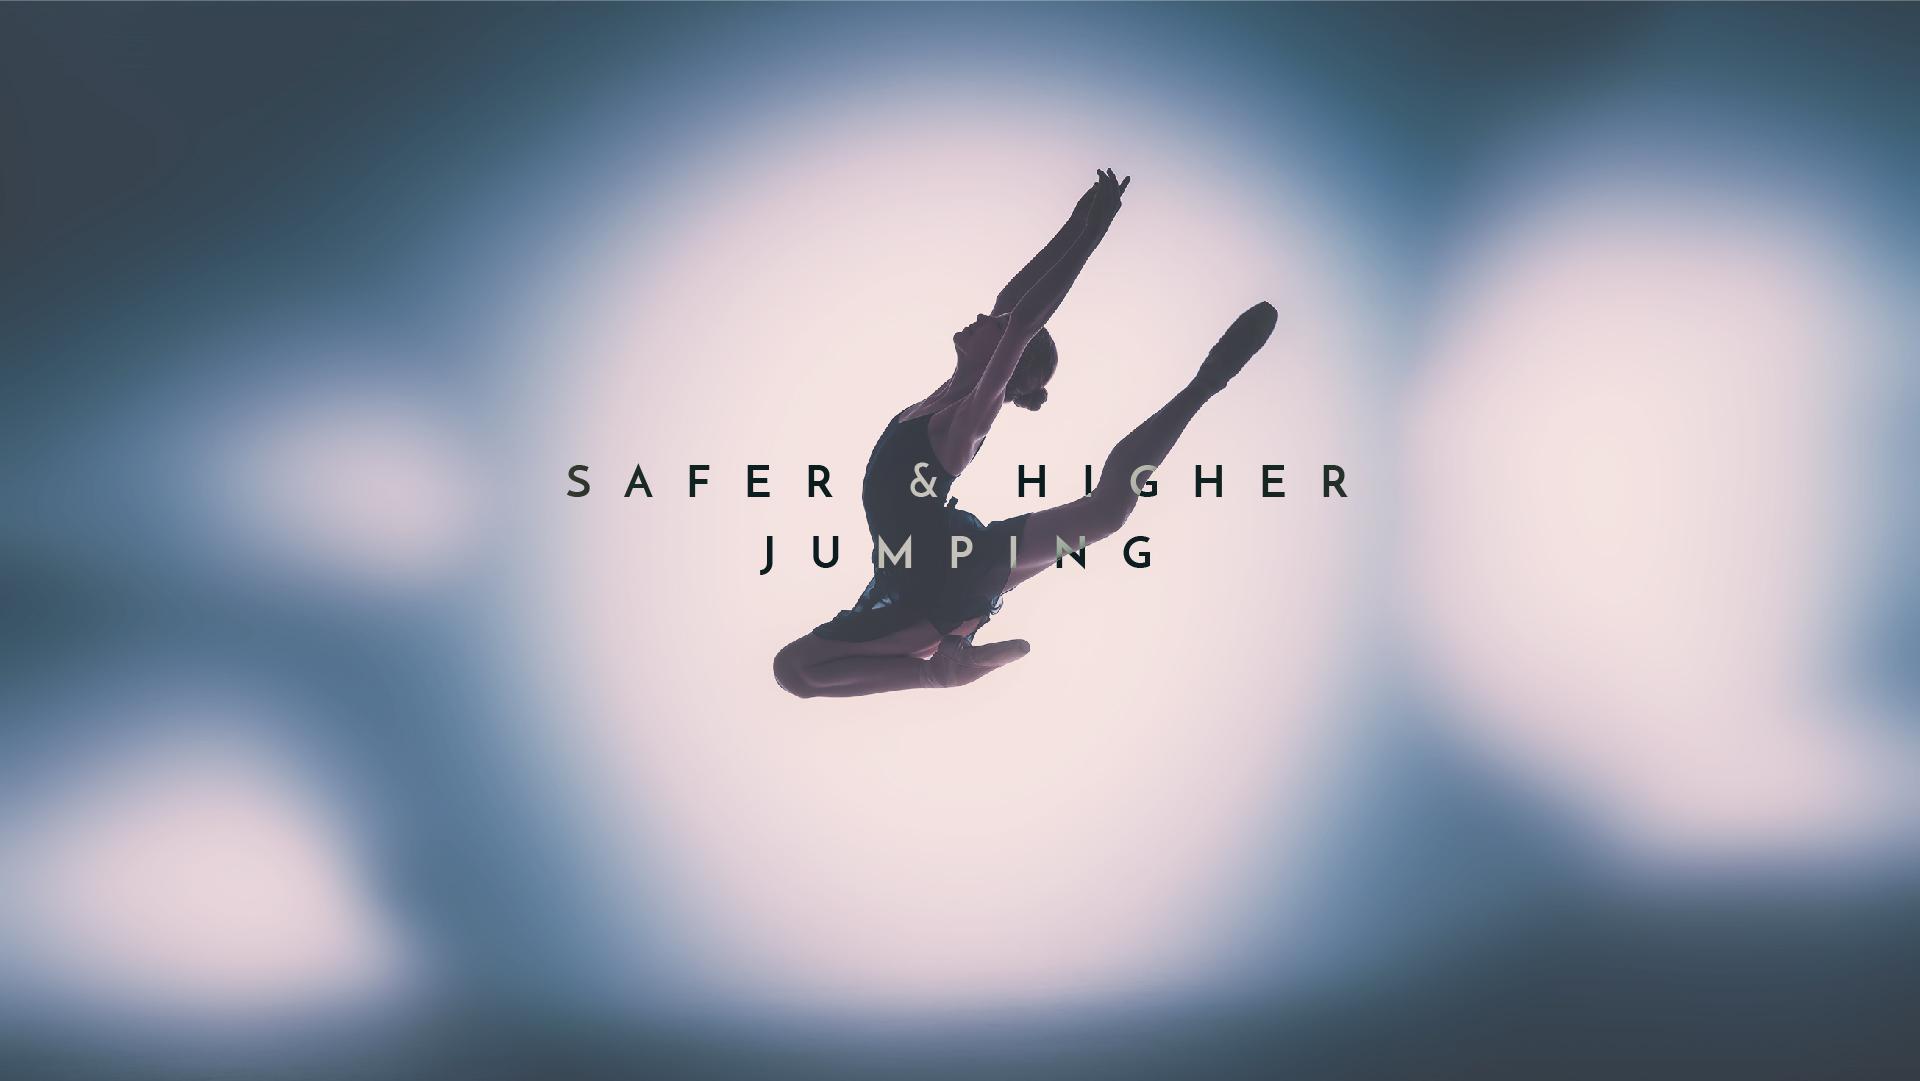 Safer Higher Jumping